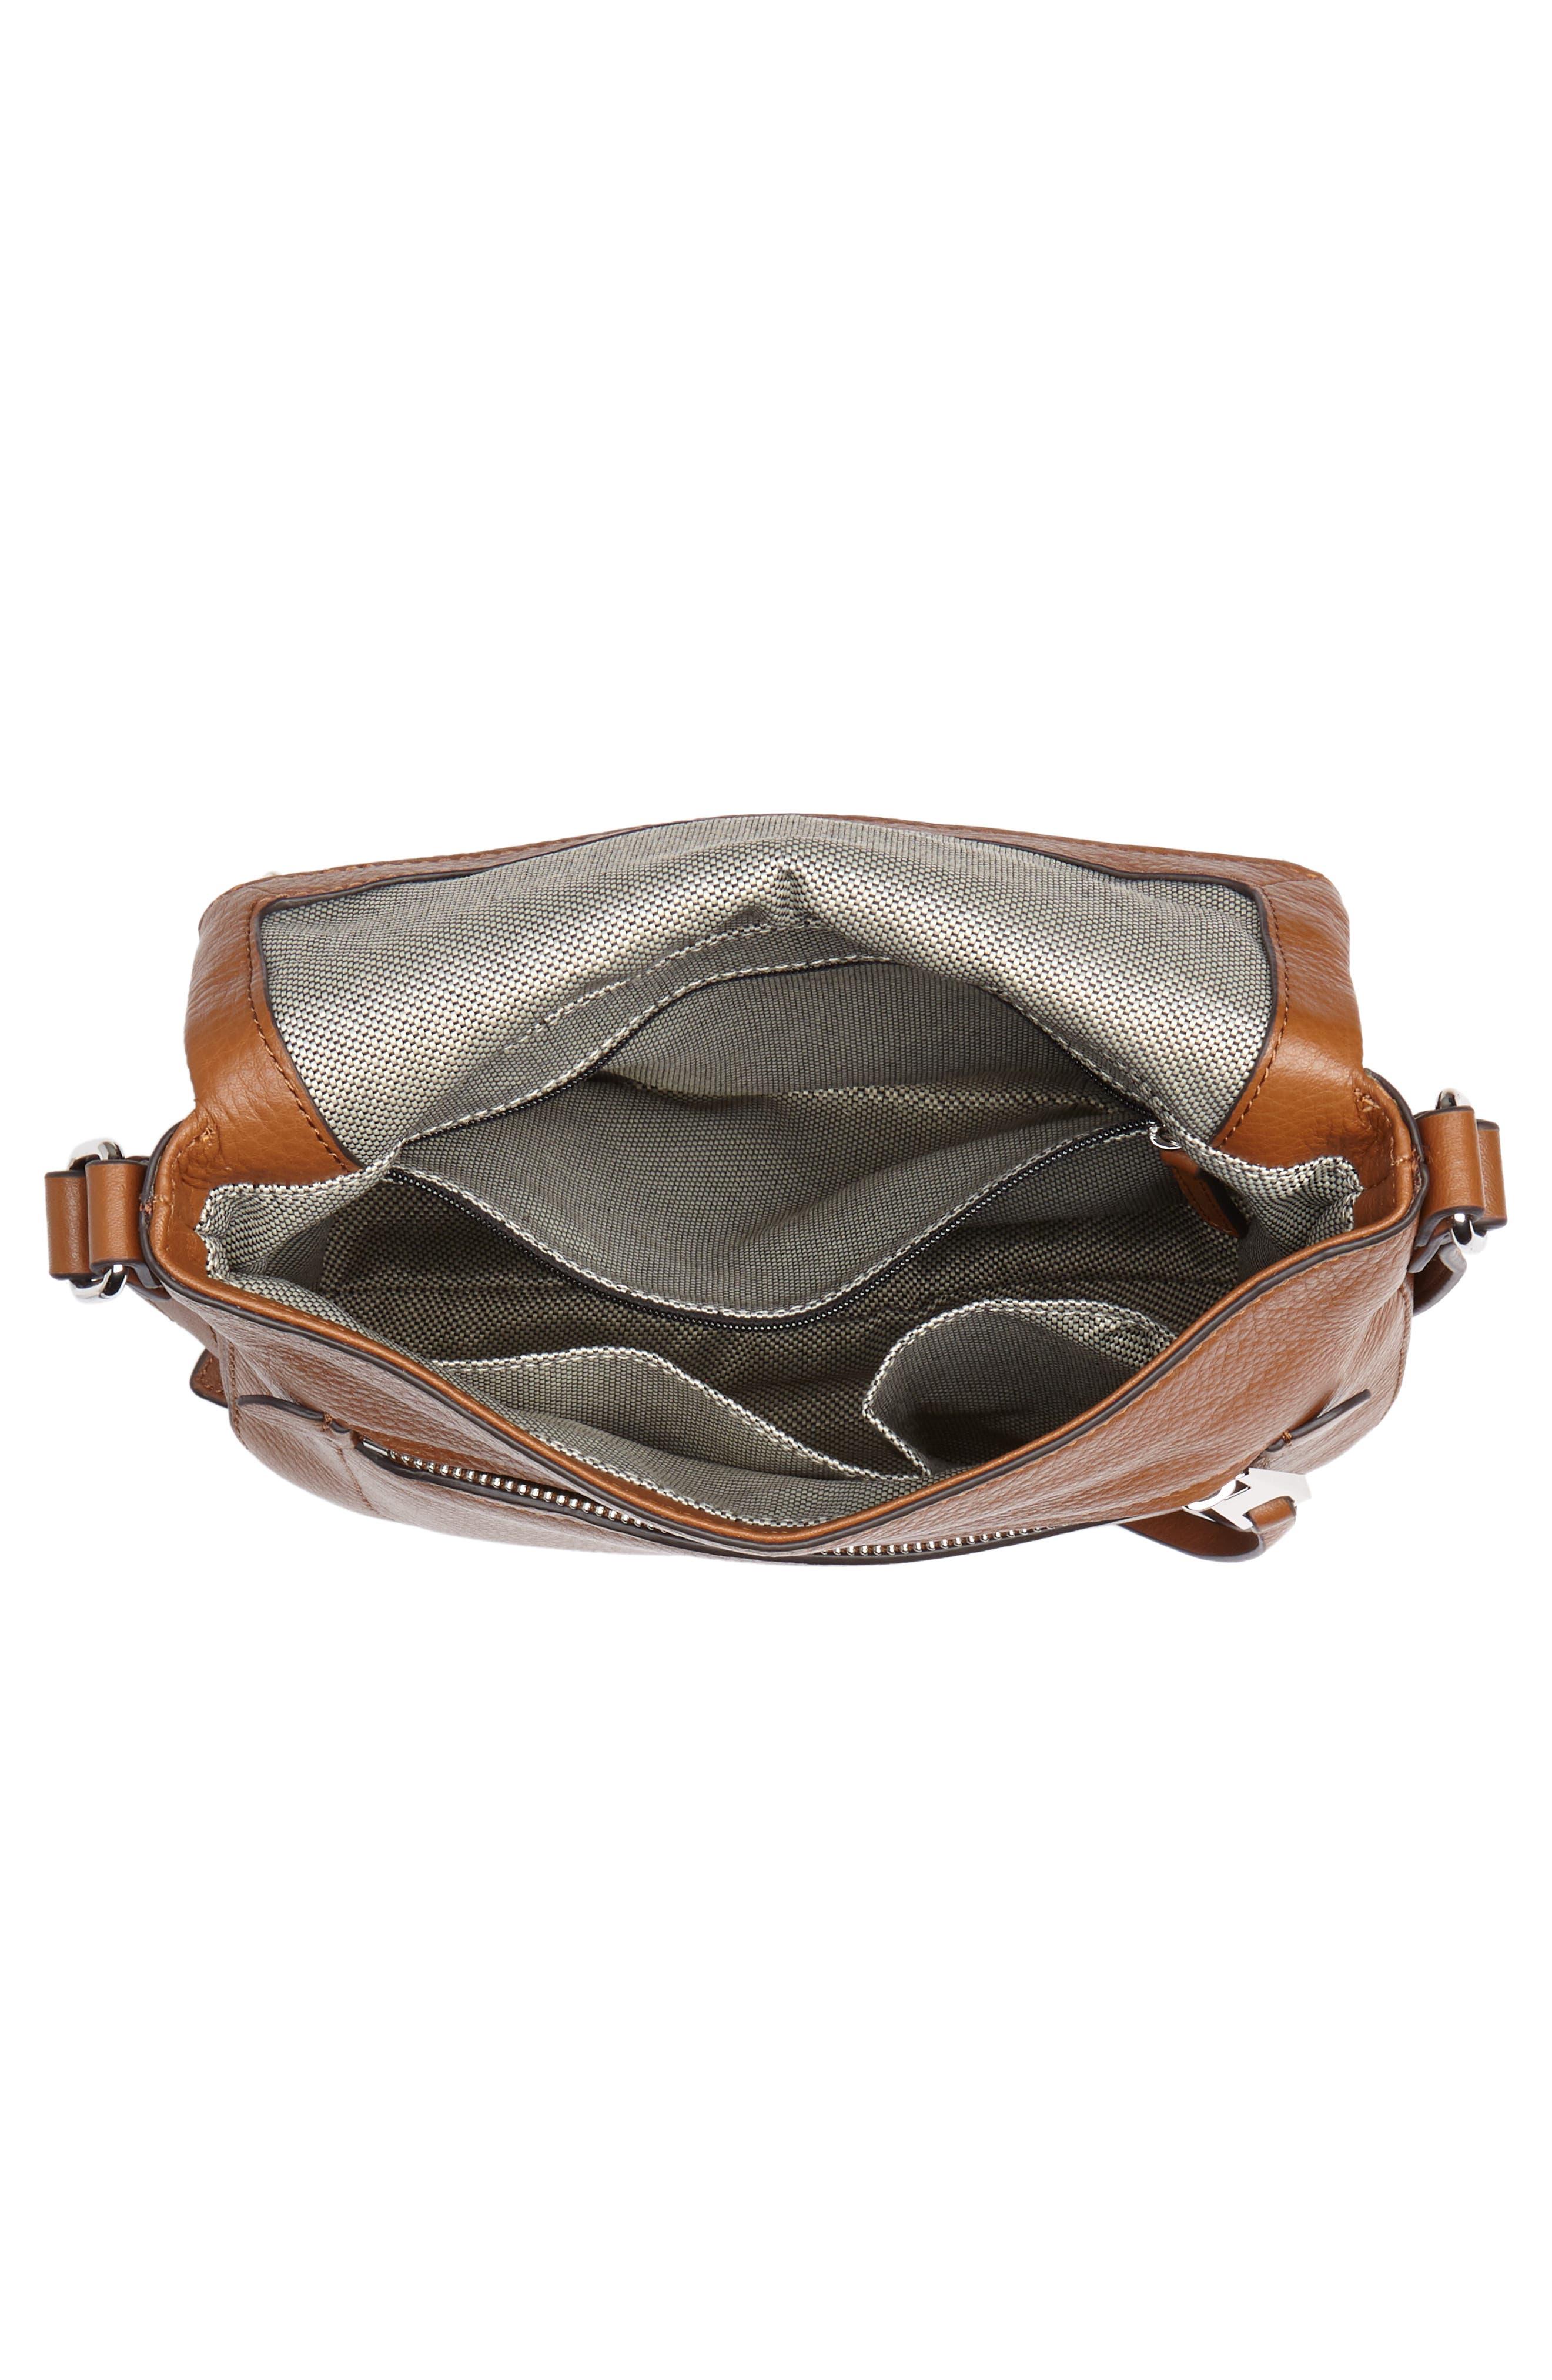 'Tala' Leather Crossbody Bag,                             Alternate thumbnail 4, color,                             Dark Rum